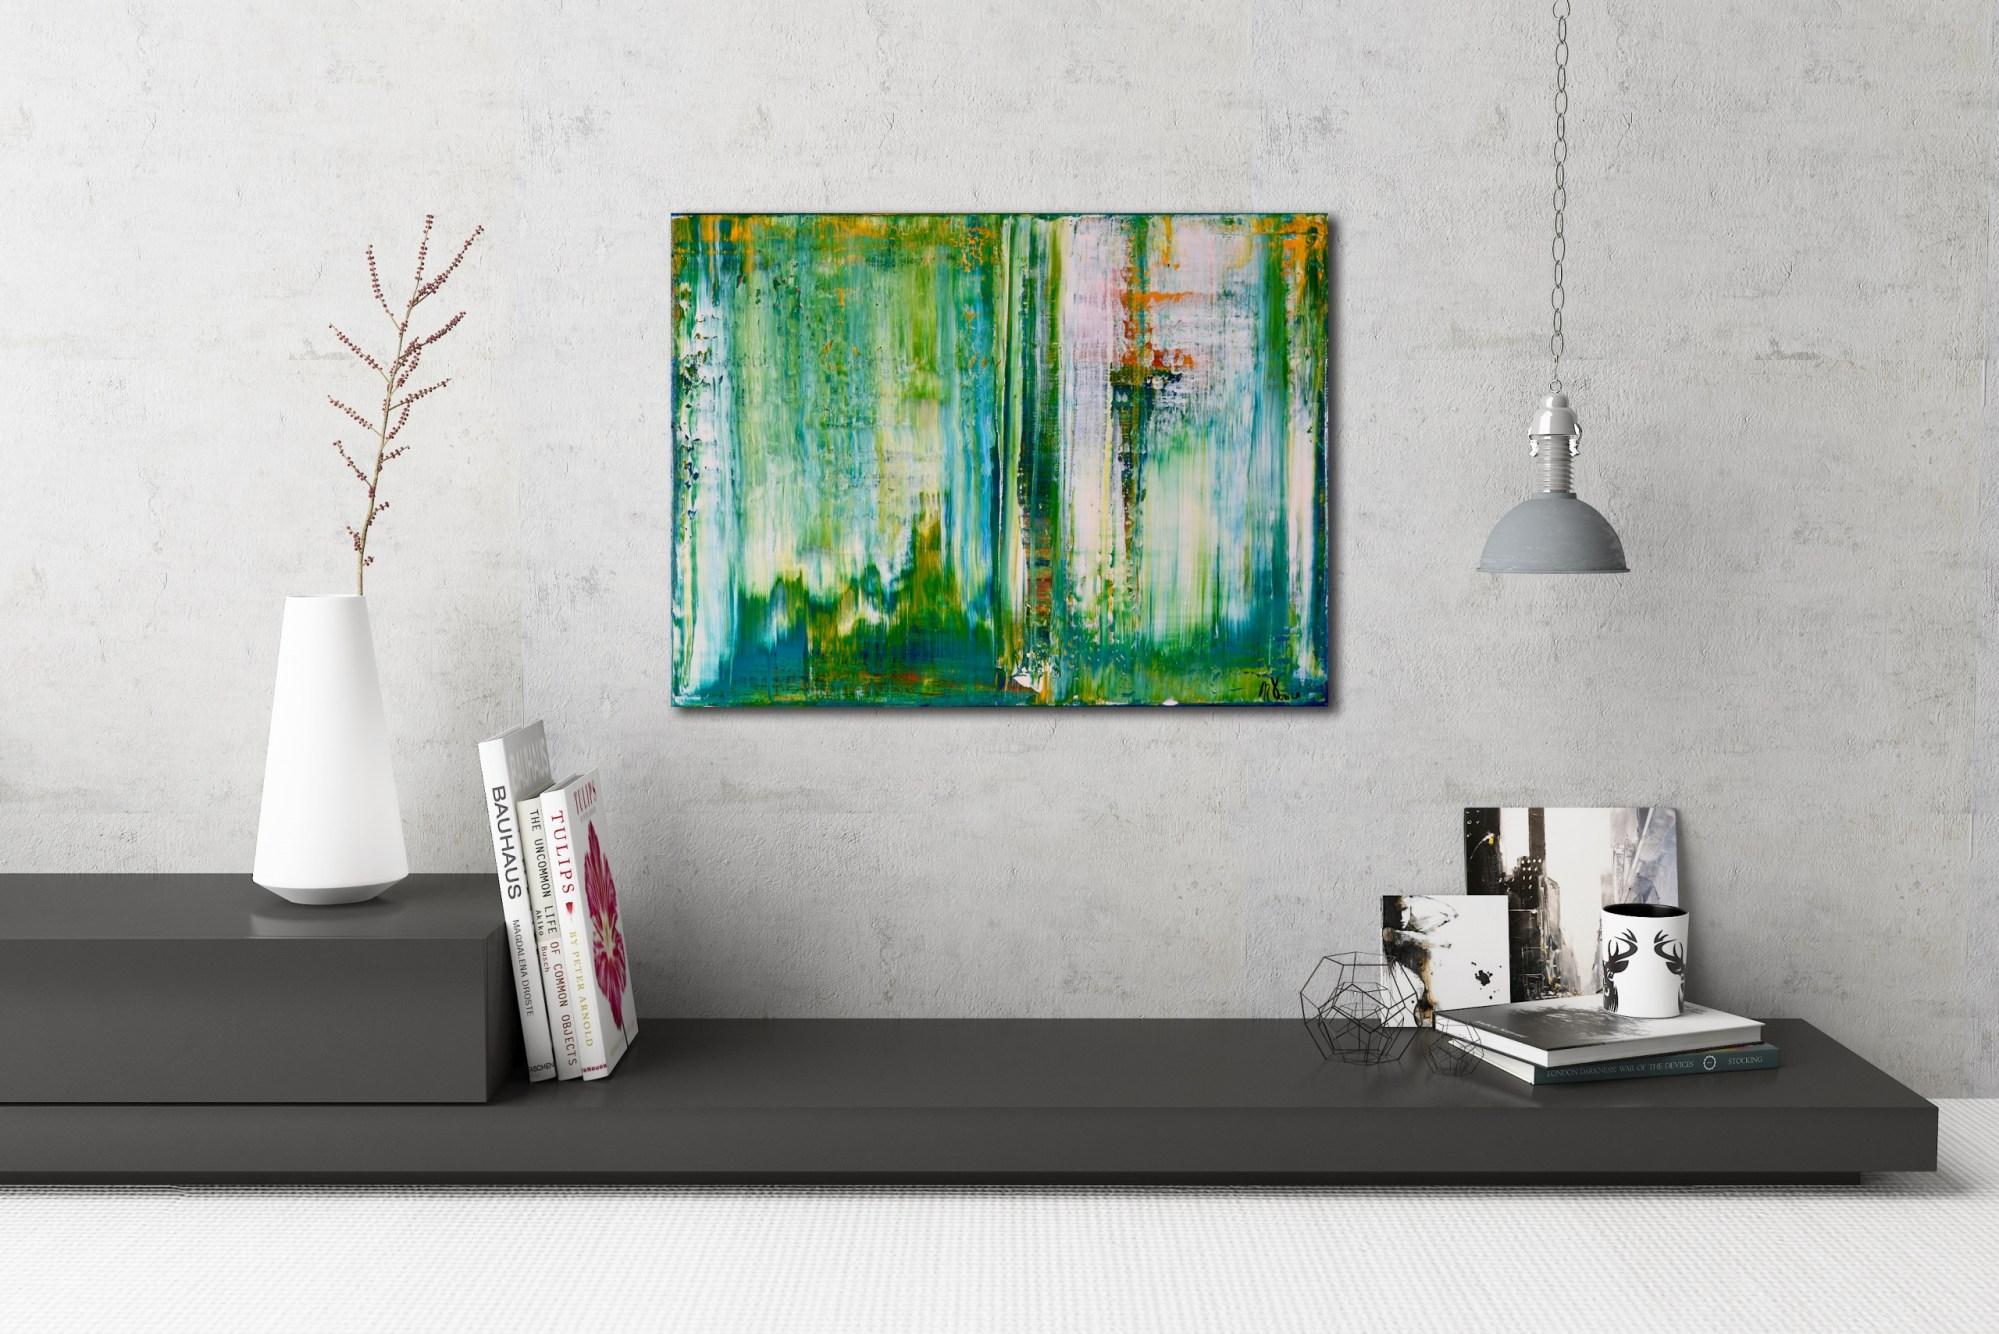 Spring Showers (2016) Acrylic painting by Nestor Toro